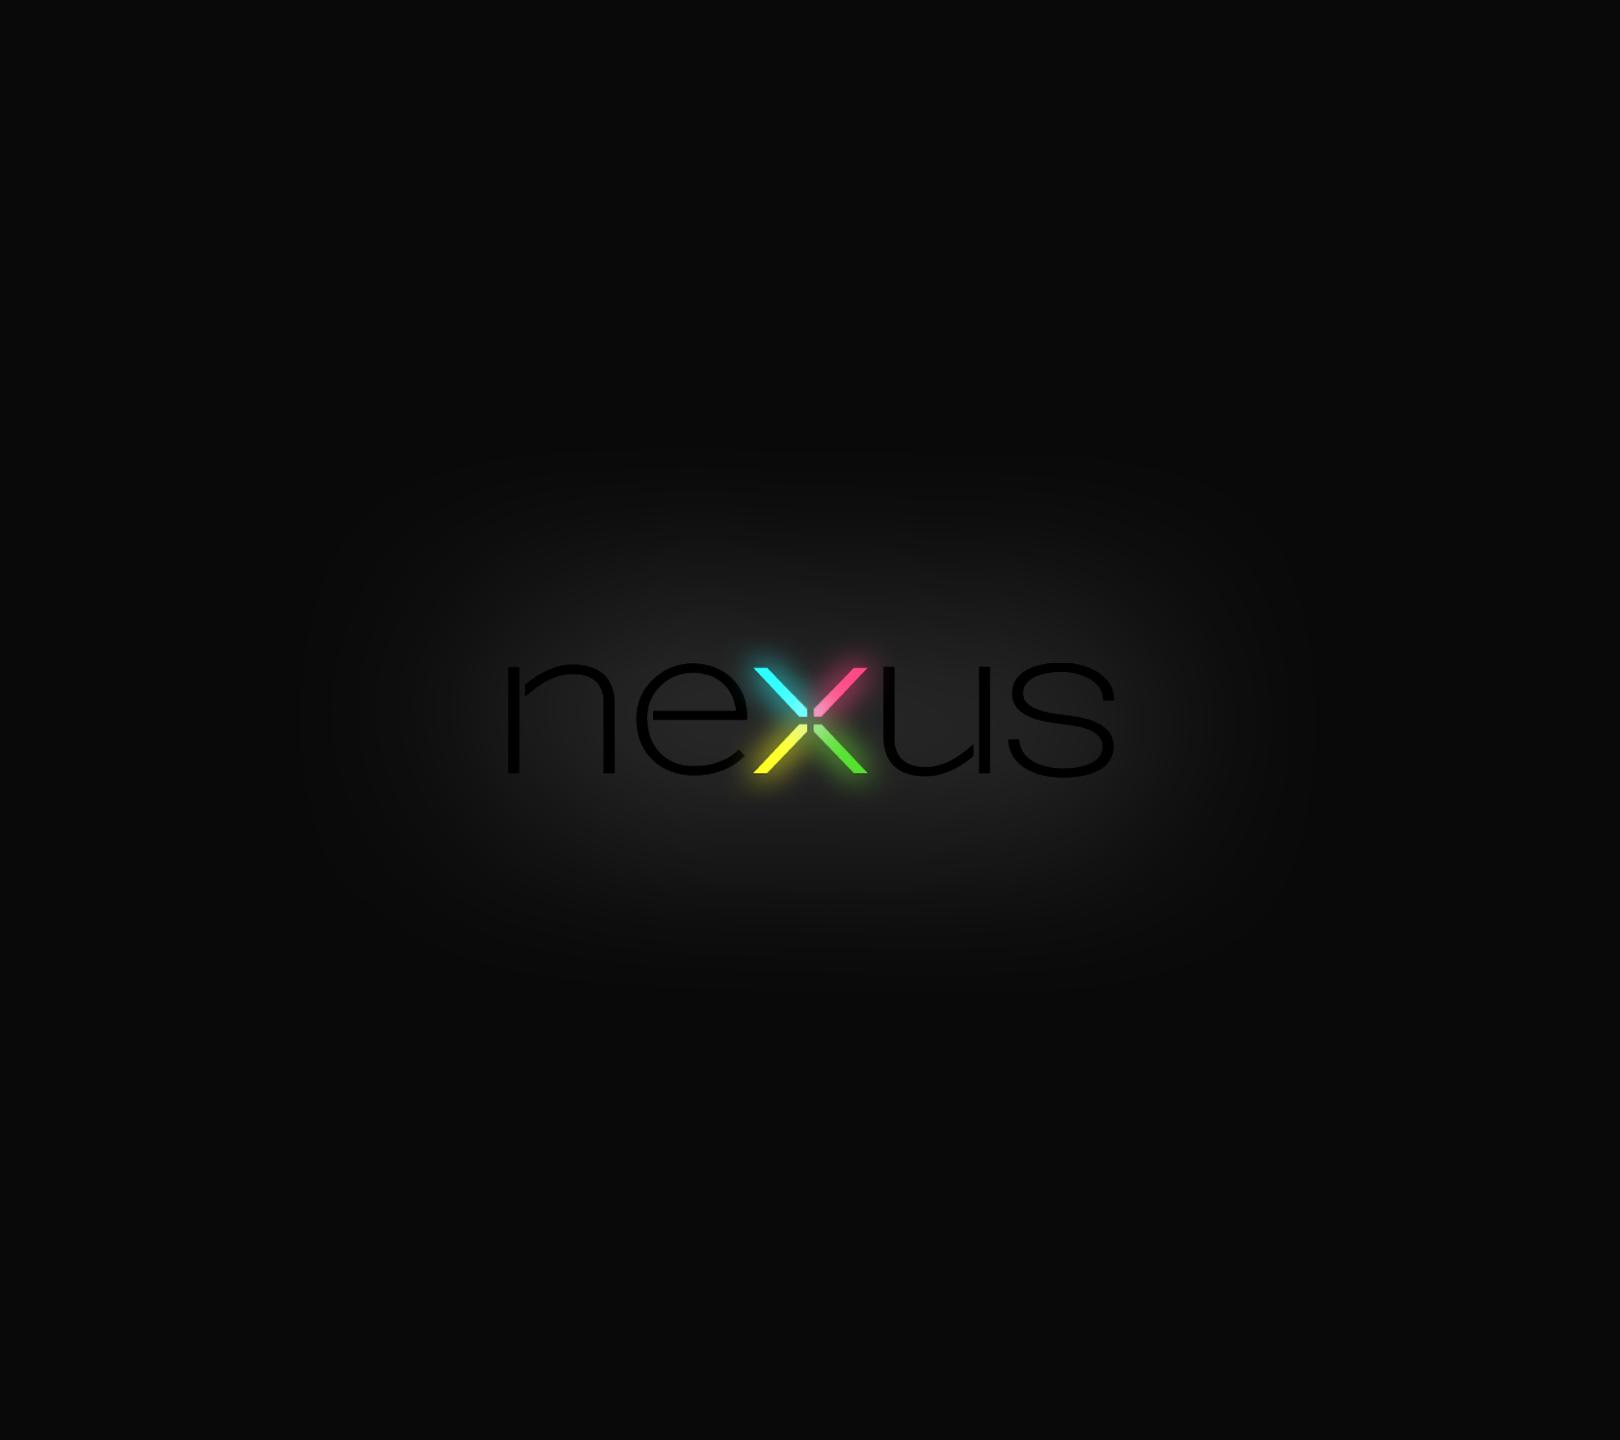 73] Nexus Desktop Wallpaper on WallpaperSafari 1620x1440